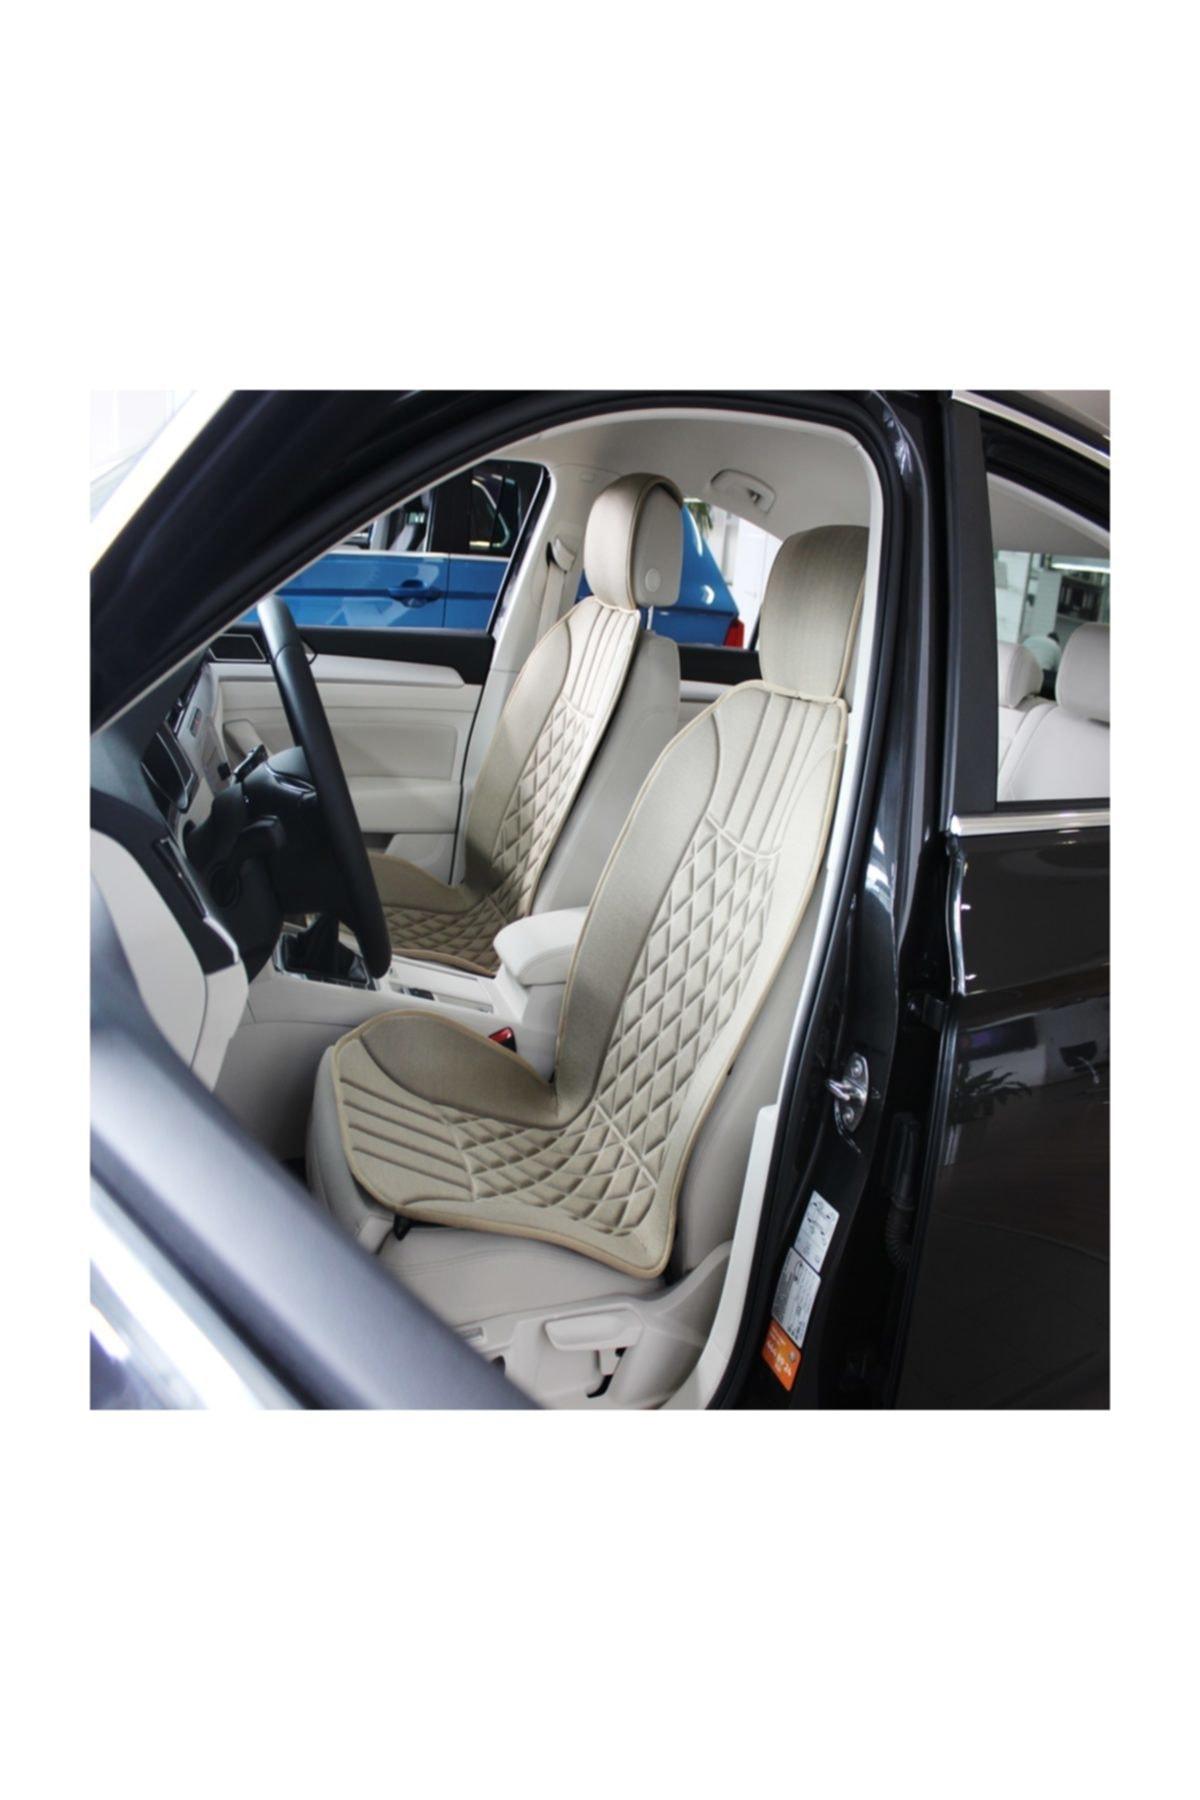 Space Toyota Corolla Serisi Oto Kilif On Koltuk Kilifi Minderi Trendyol